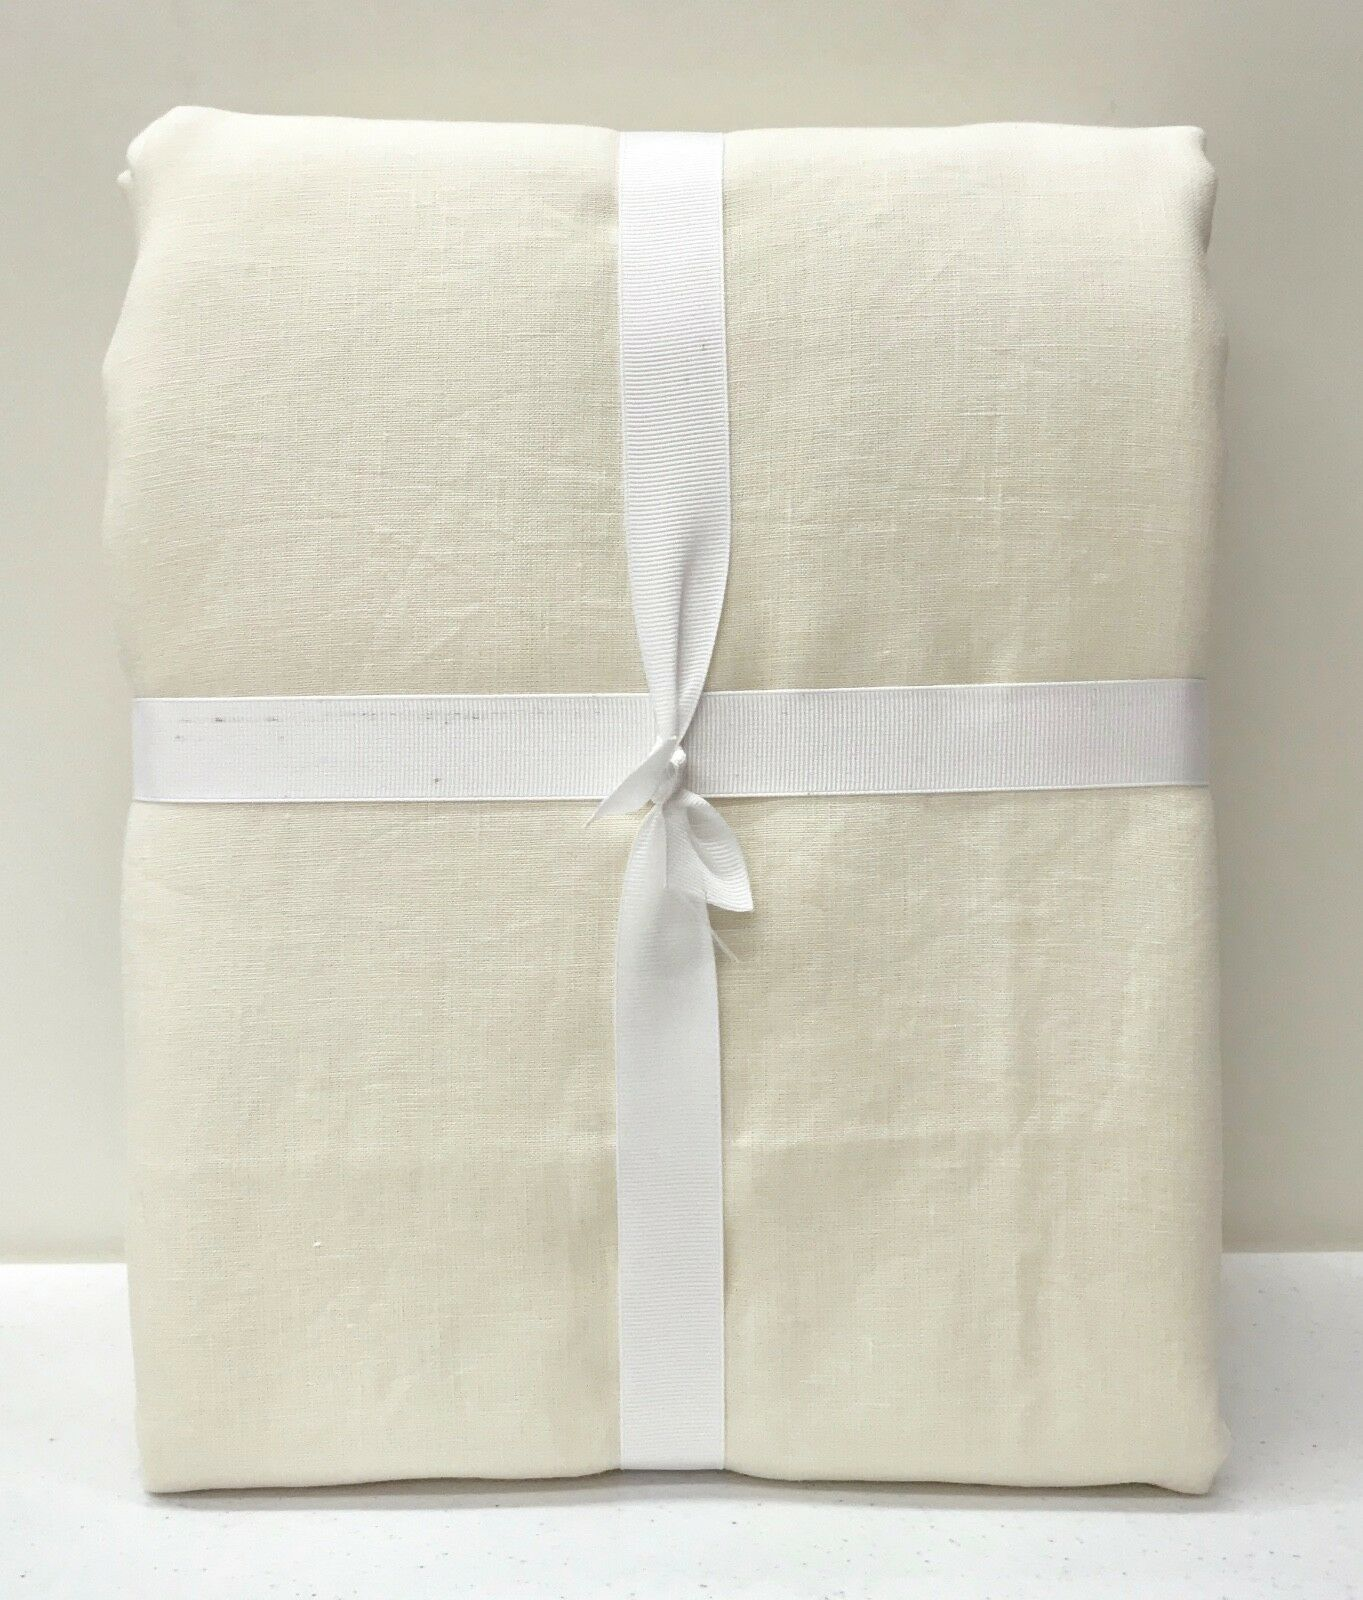 NEW Williams Sonoma Signature Linen KING Duvet CoverIVORYBelgian Flax Linen